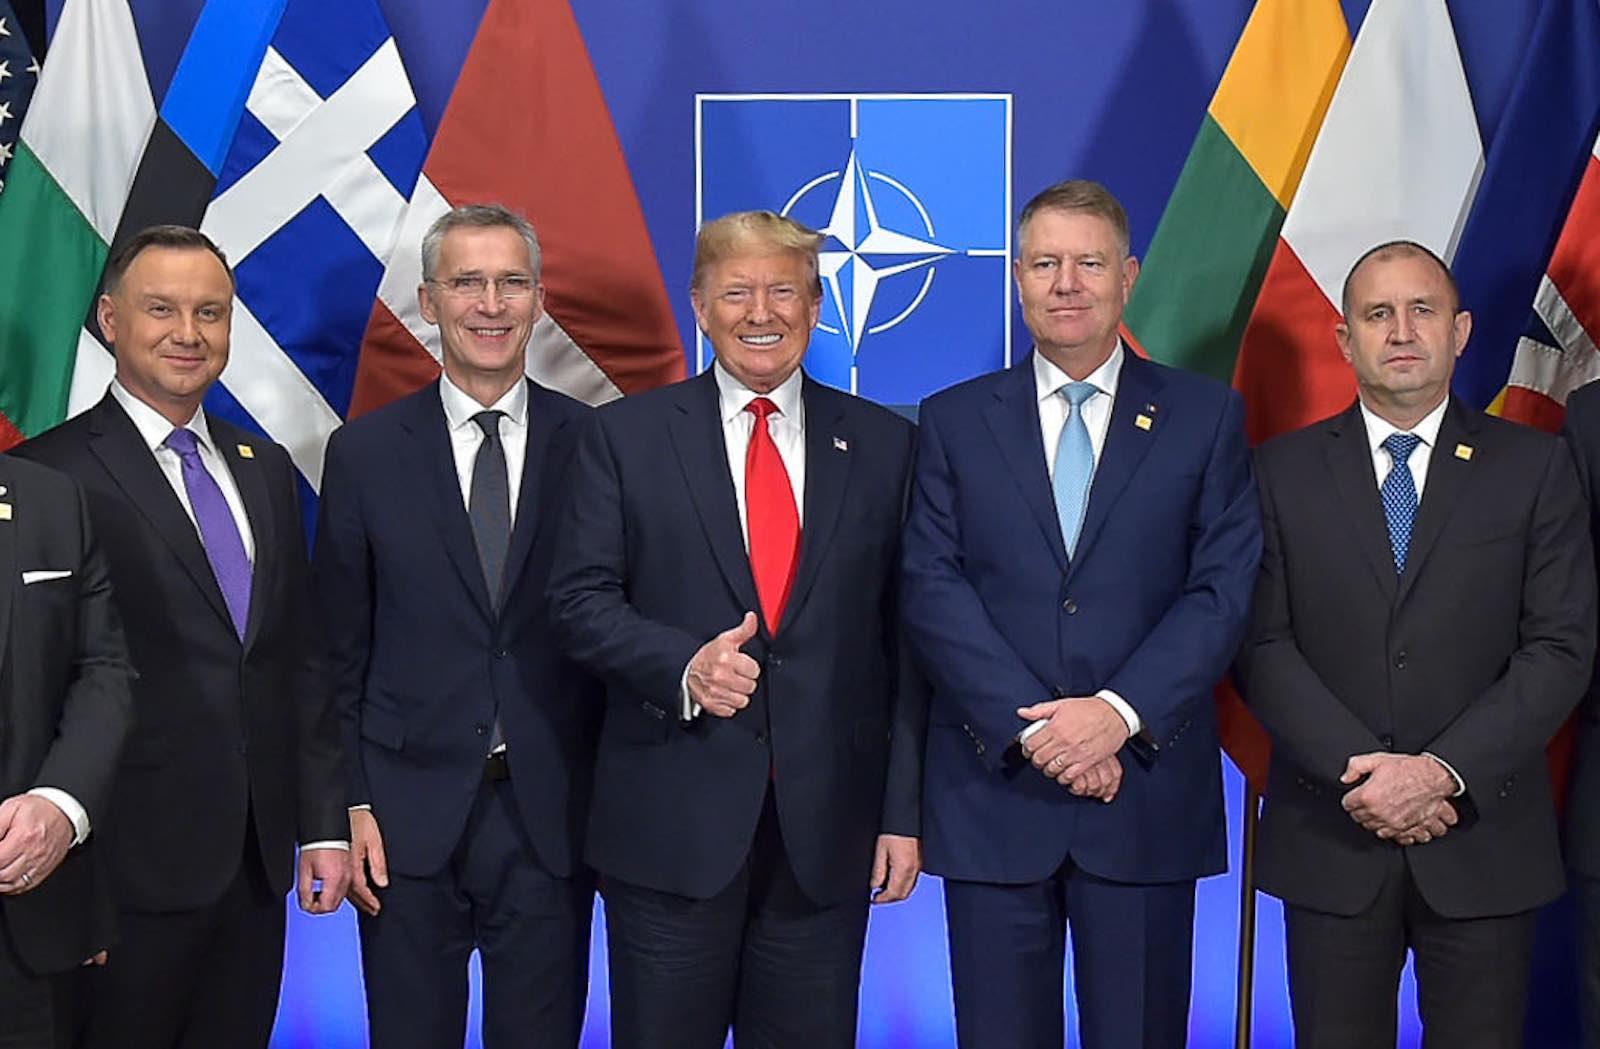 A working lunch including Poland's President Andrzej Duda, NATO Secretary General Jens Stoltenberg, US President Donald Trump, Romanian President Klaus Werner Iohannis, Bulgarian President Rumen Radev (Photo: NATO/Flickr)